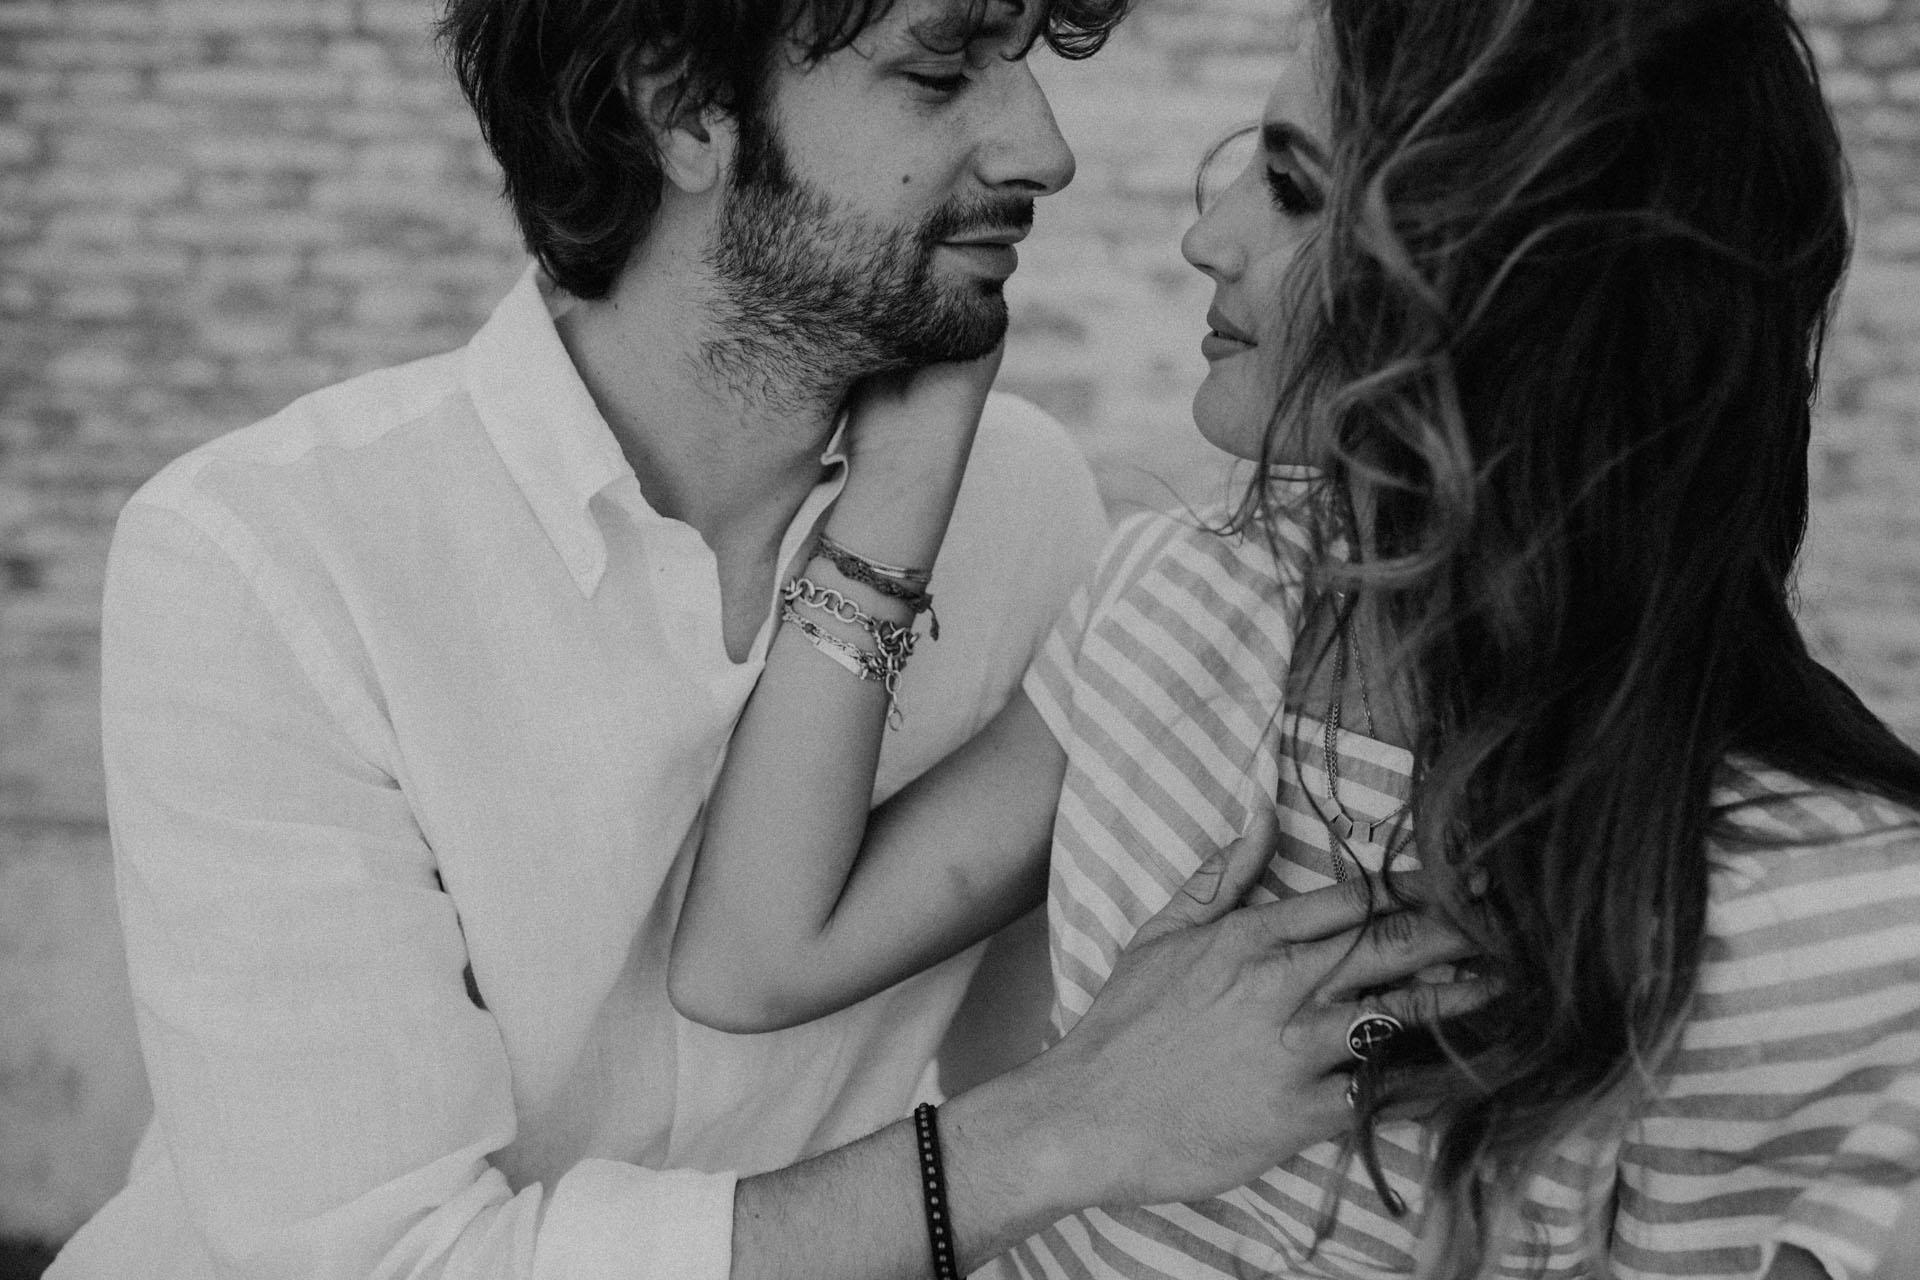 coupleshooting-roma-hochzeitsfotografen-wien-agnesundandi-21